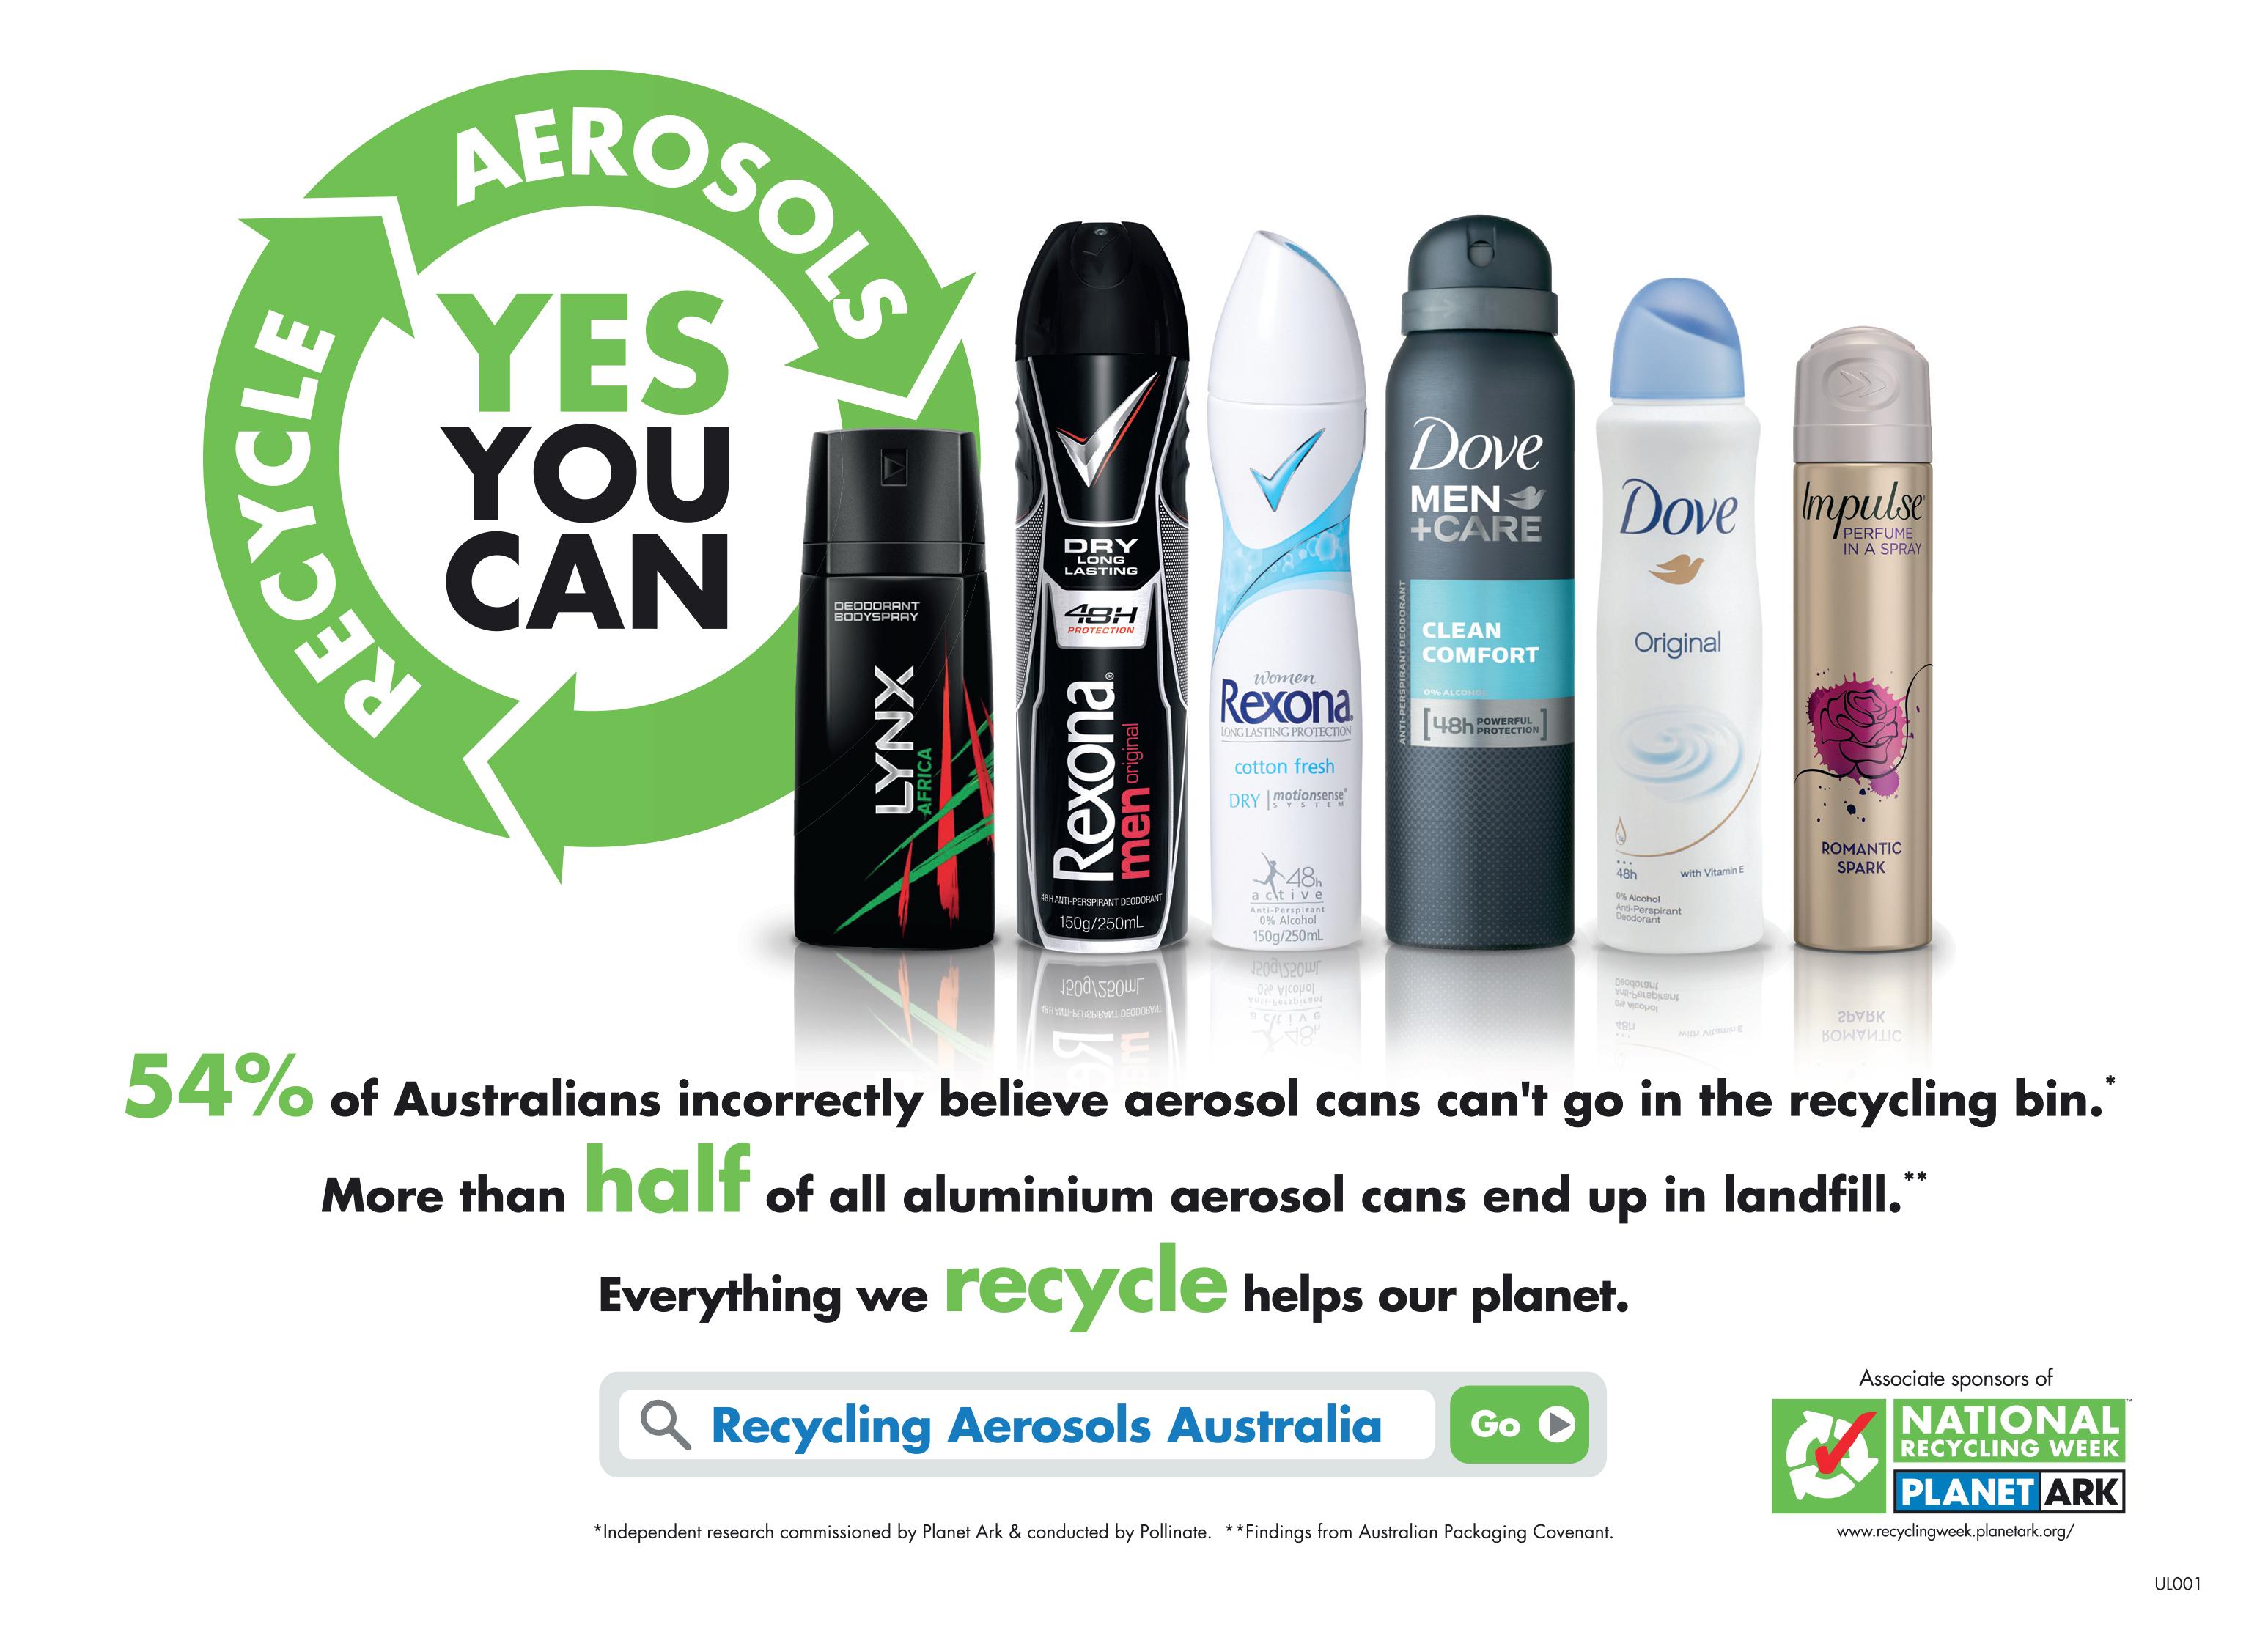 Unilever-PlanetArk-National Recycling Week